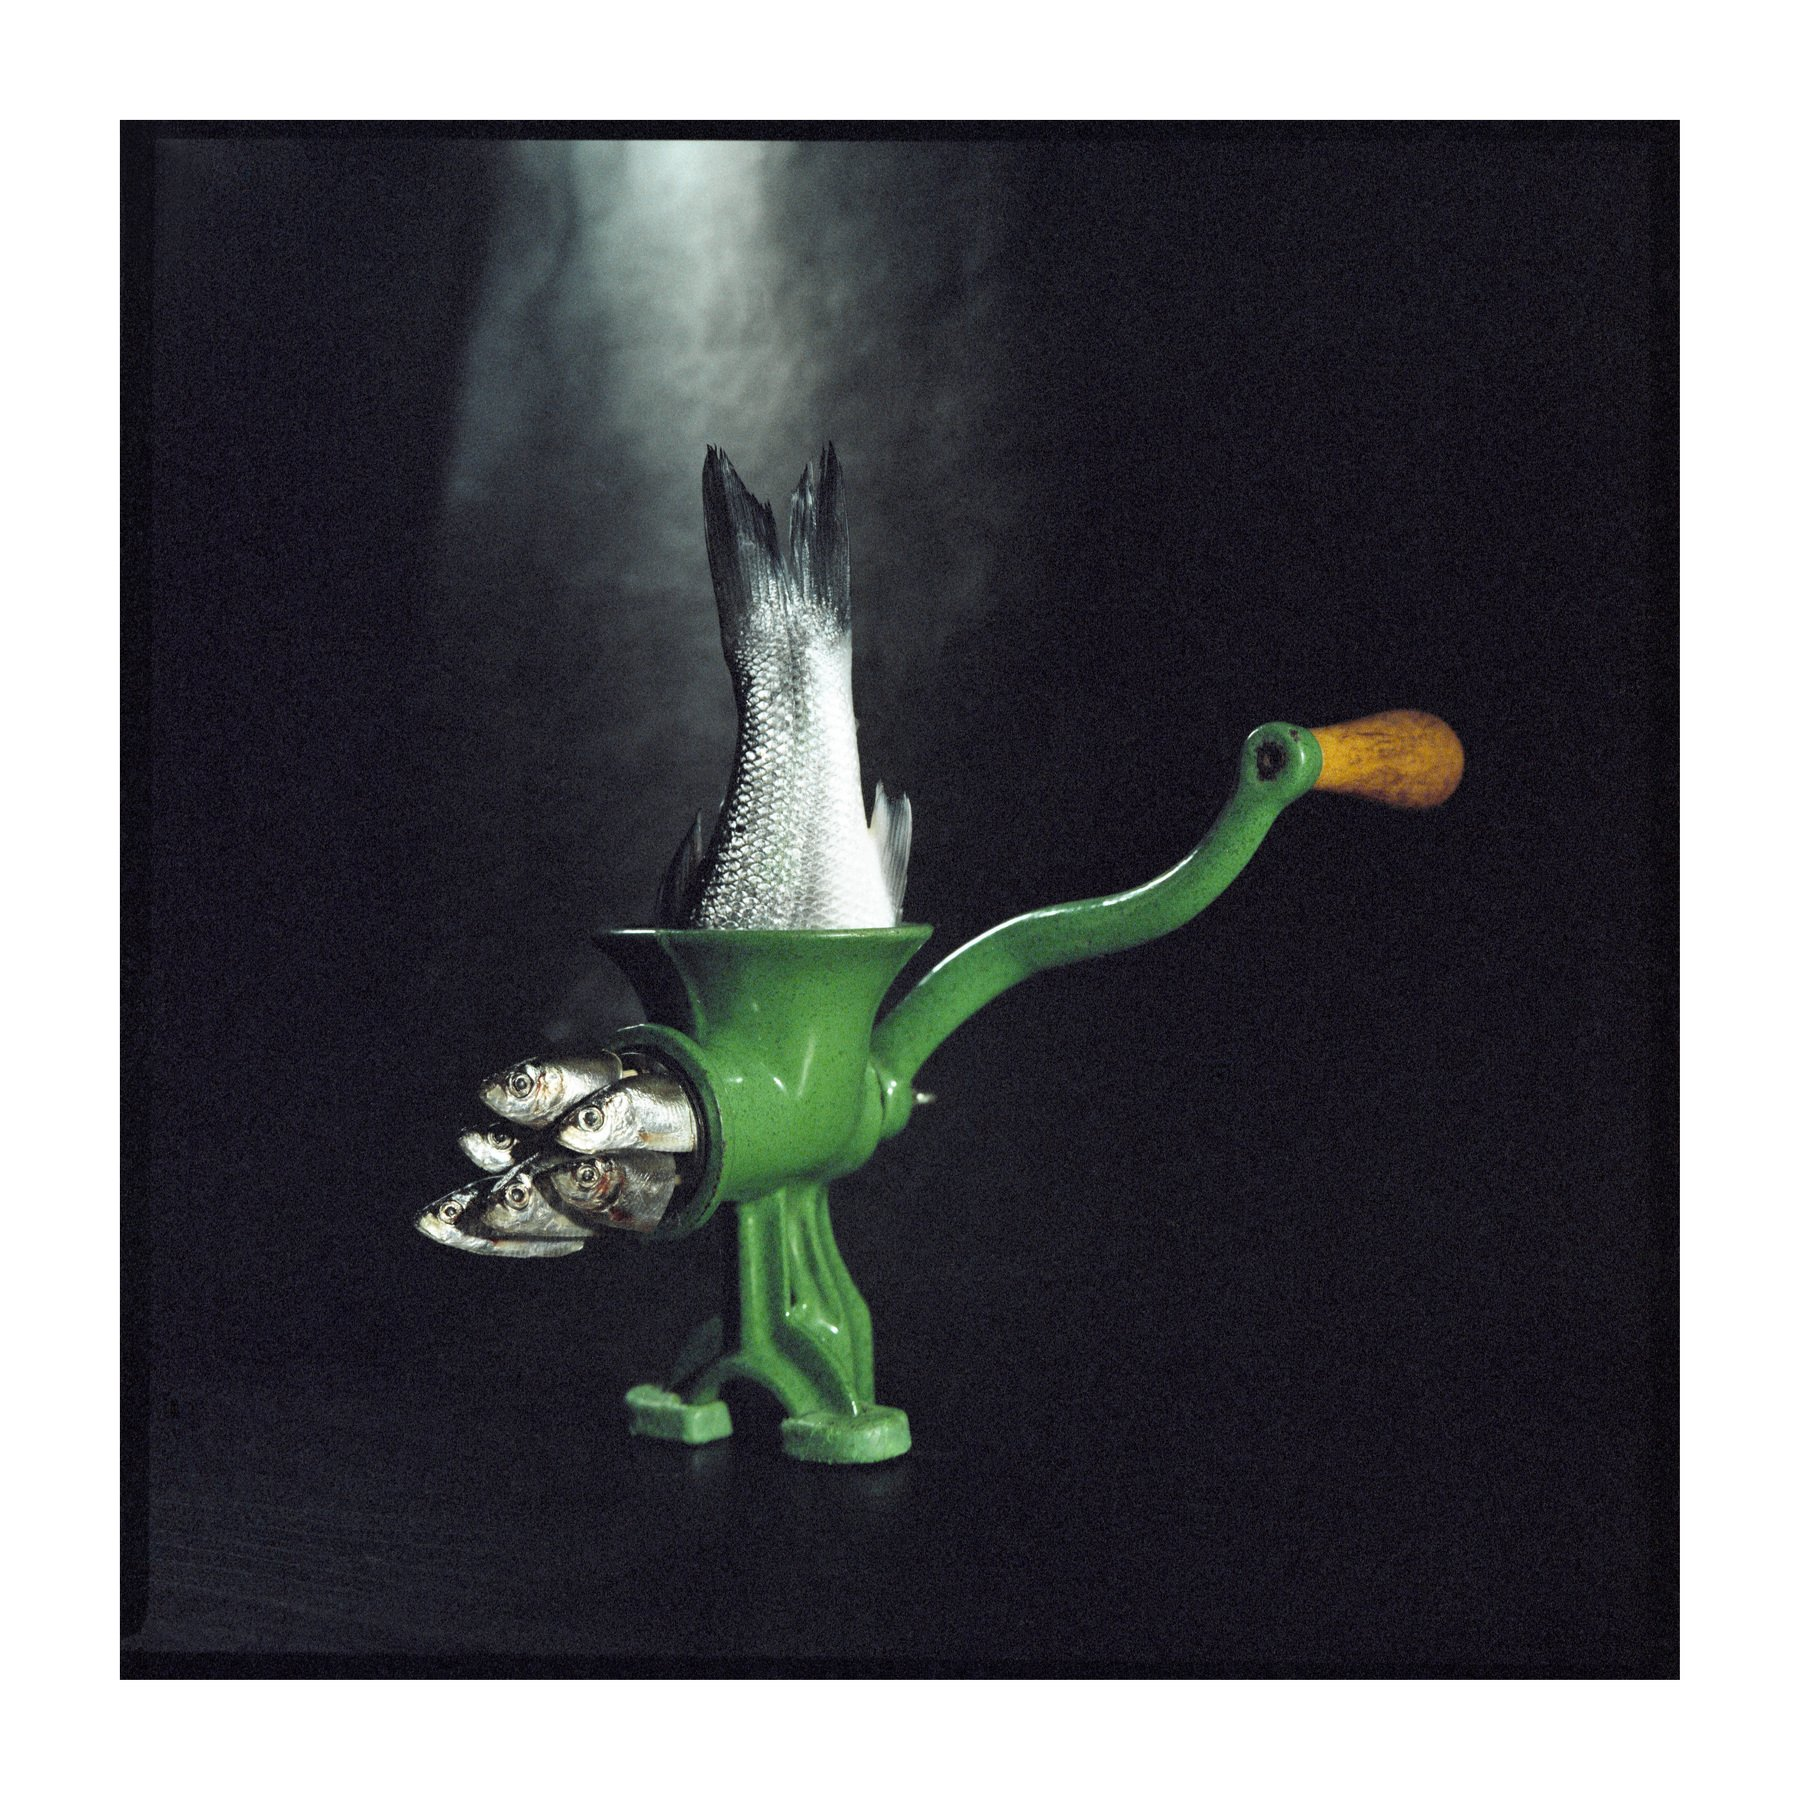 Film, analogue, art, fish, miracles, ironic, series, surrealism, Tomas